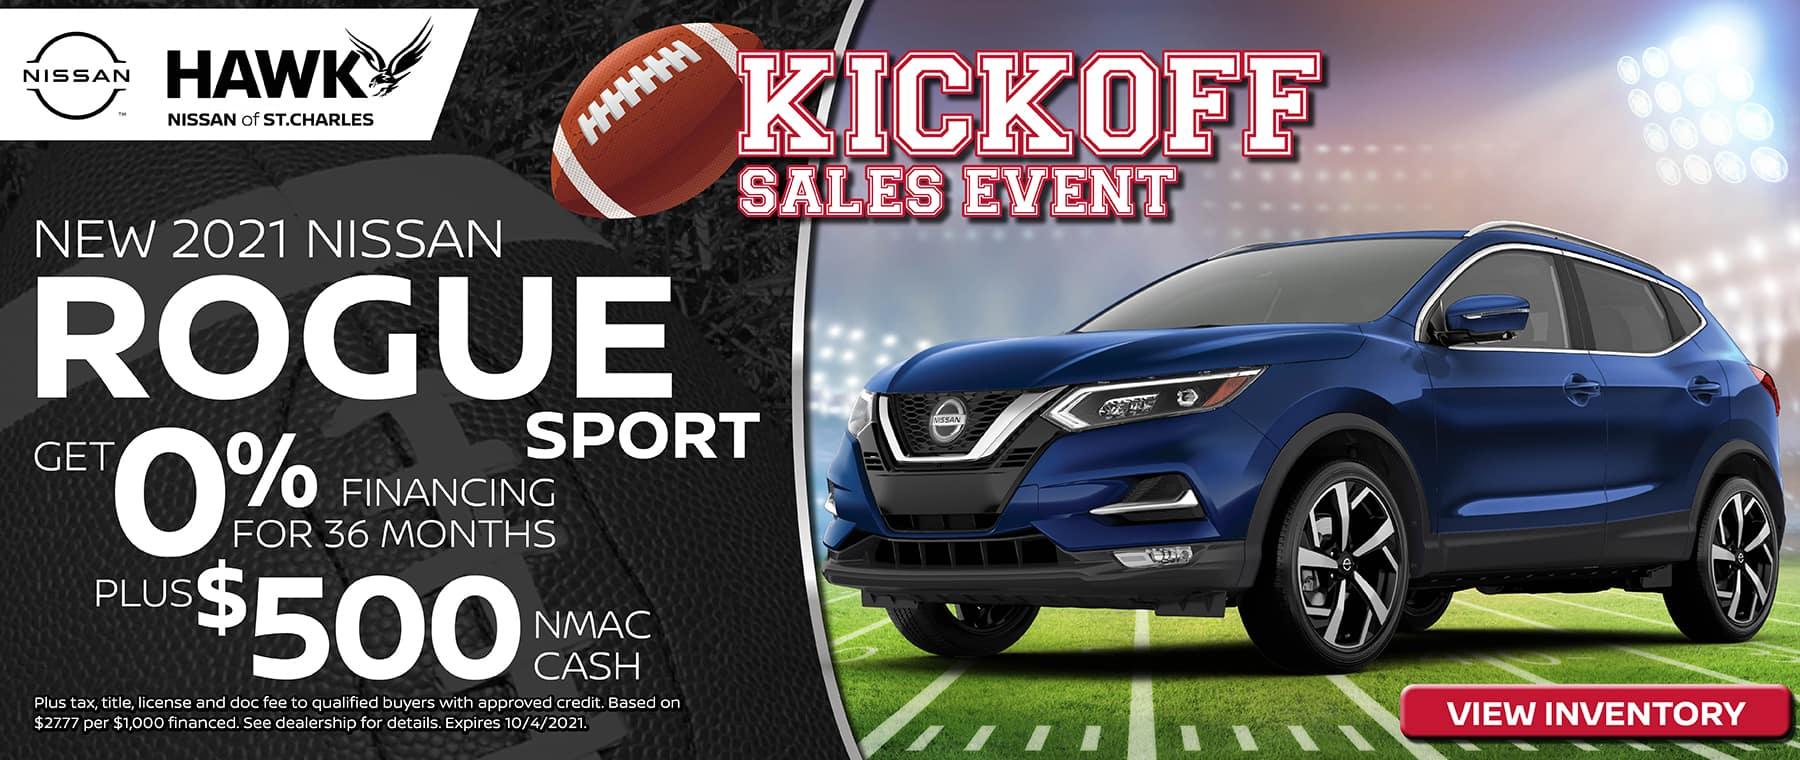 2021 Nissan Rogue Sport Finance Offer | Hawk Nissan St. Charles